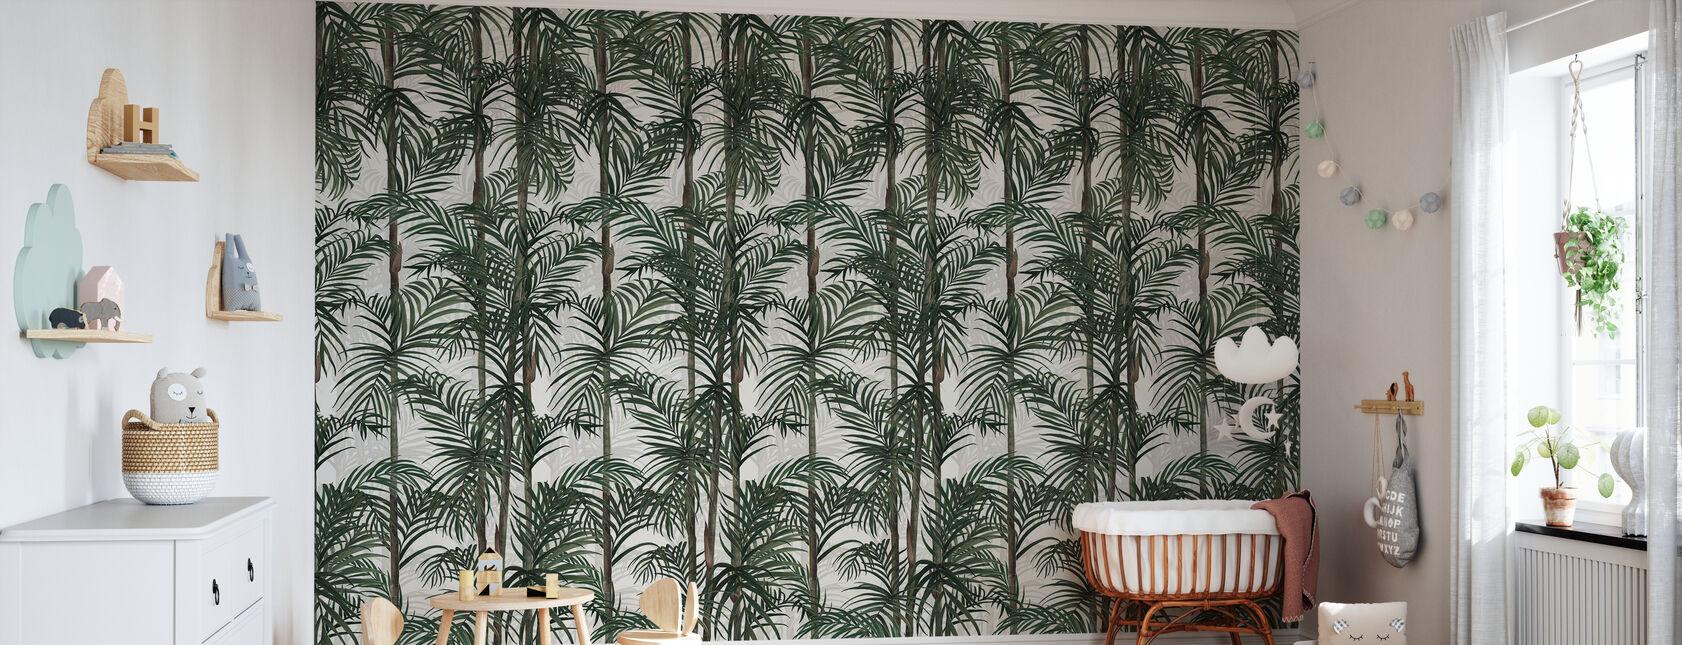 Botanik Bambus - Grün - Tapete - Babyzimmer